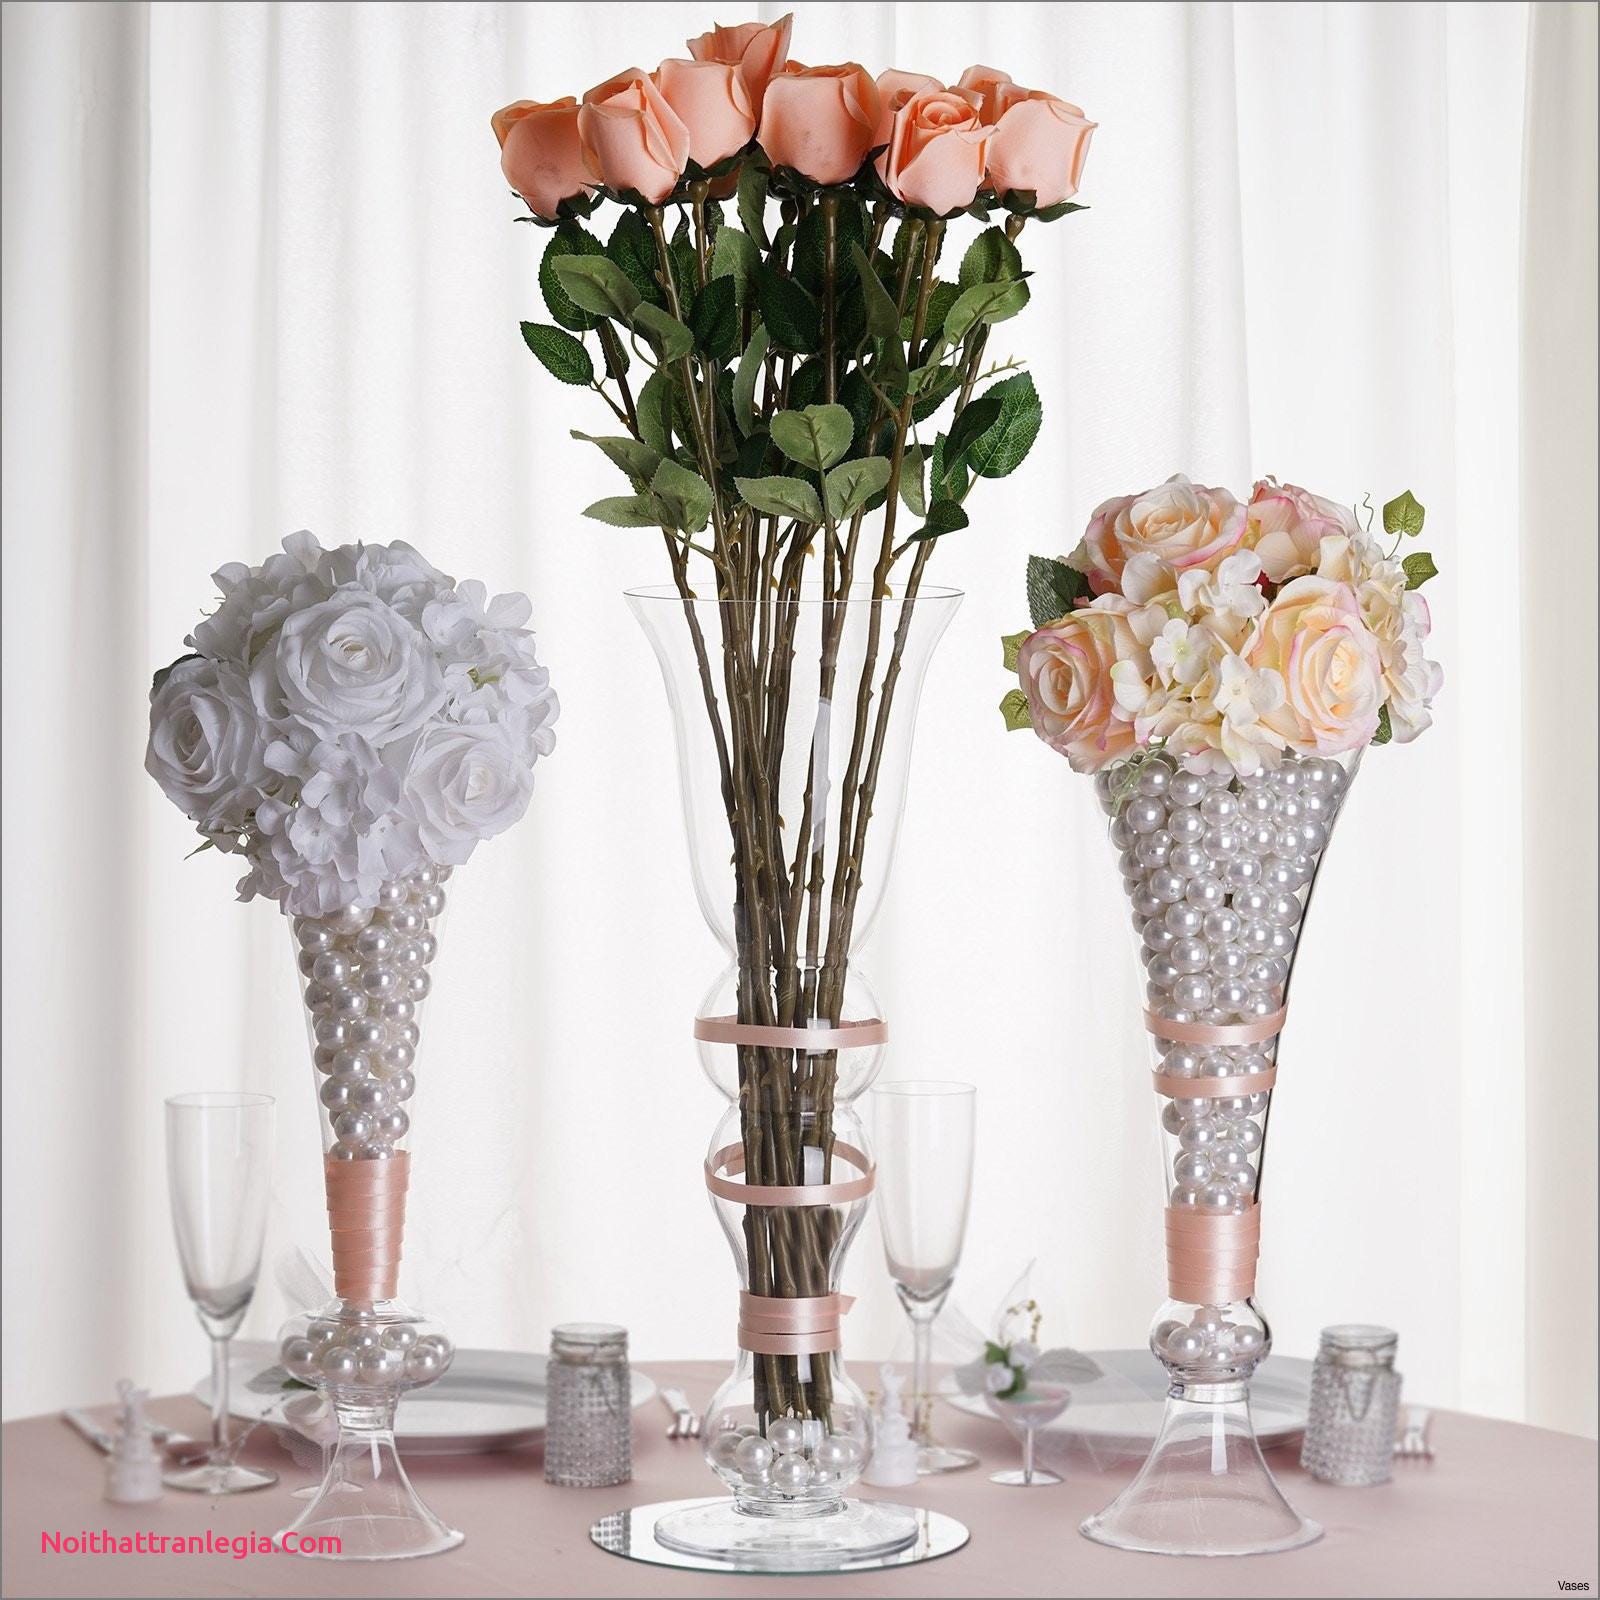 artificial roses in vase of 20 how to clean flower vases noithattranlegia vases design inside update clipart awesome flower vase table 04h vases tablei 0d clipart dining base end design